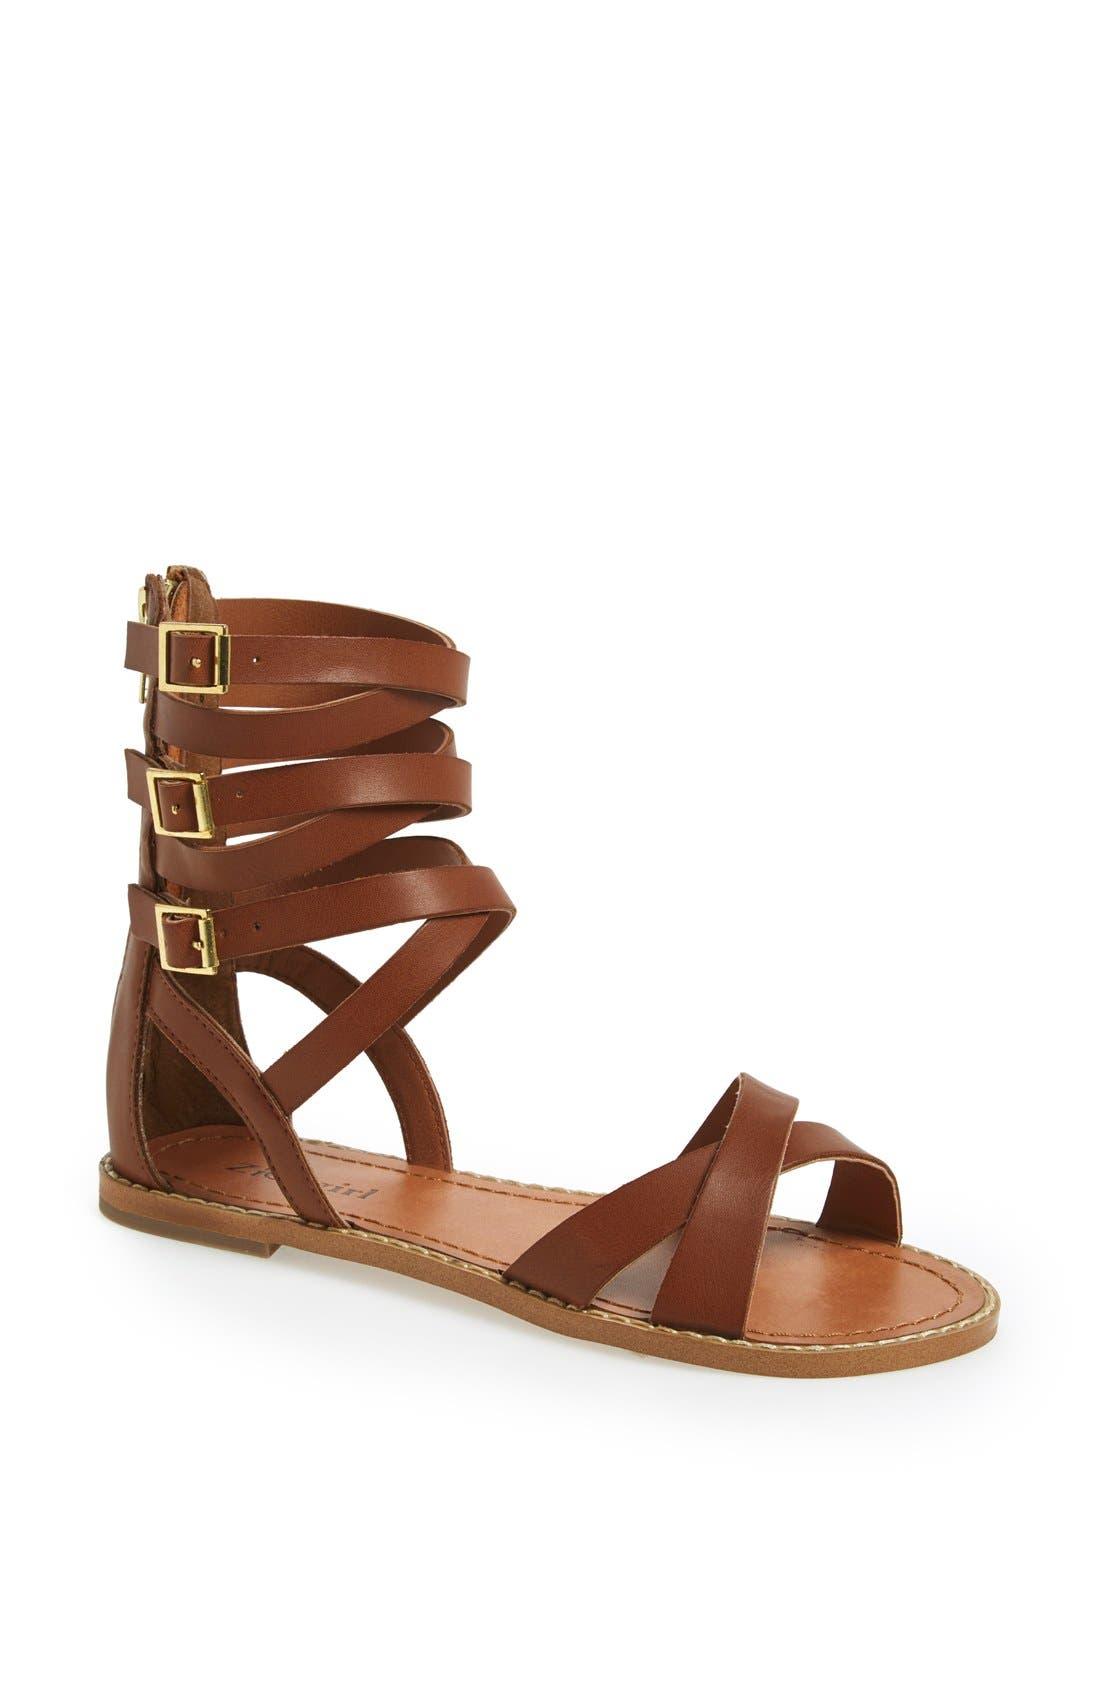 Main Image - ZiGi girl 'Science' Sandal